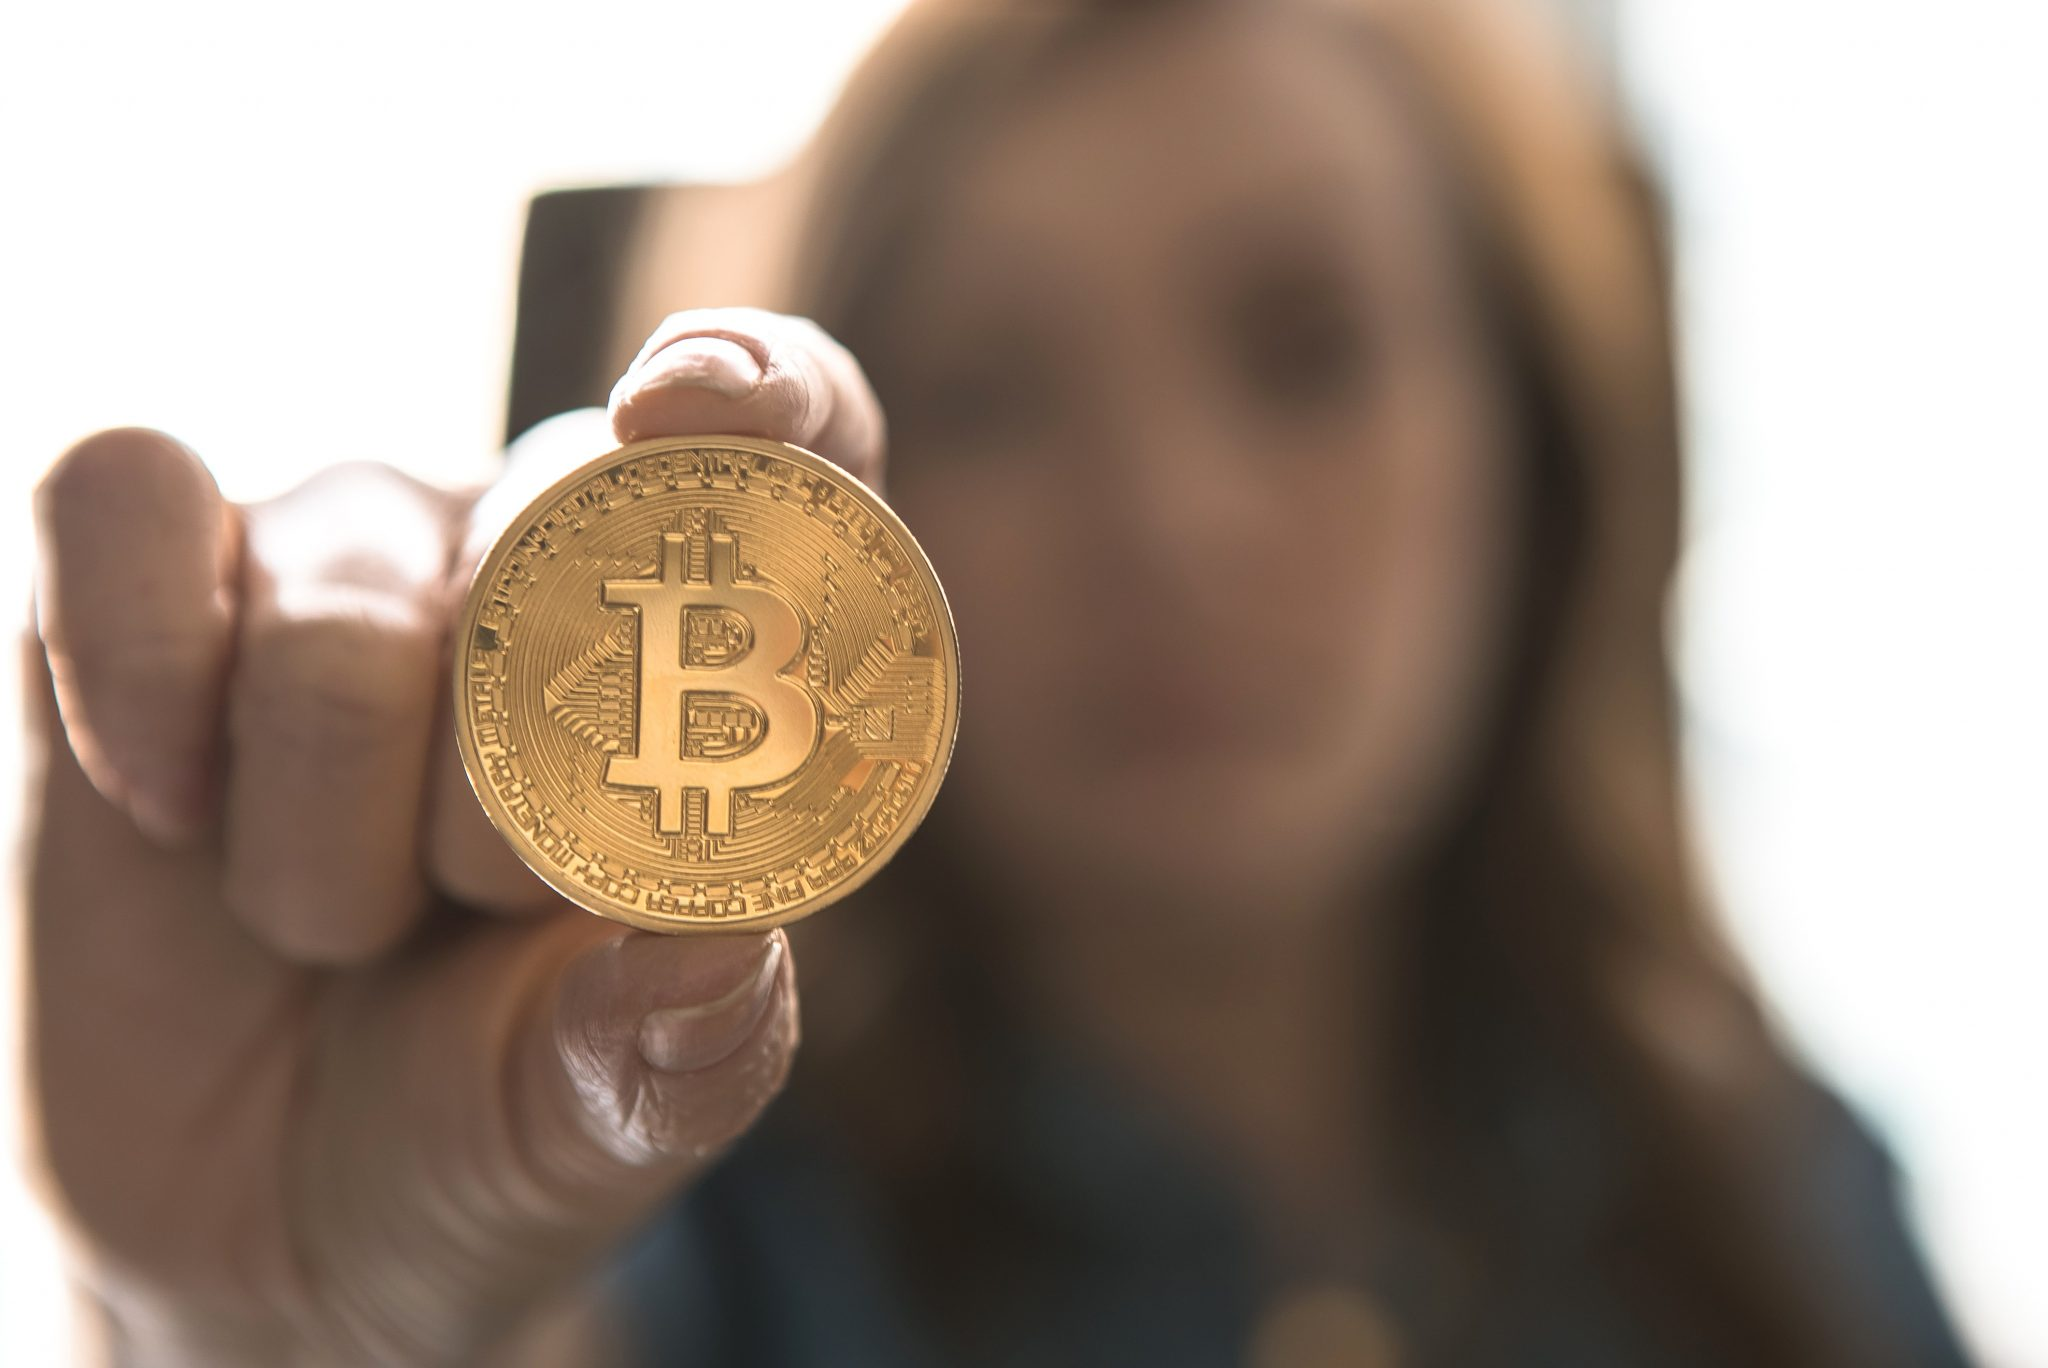 Binance has $41 million of Bitcoin stolen by Hackers